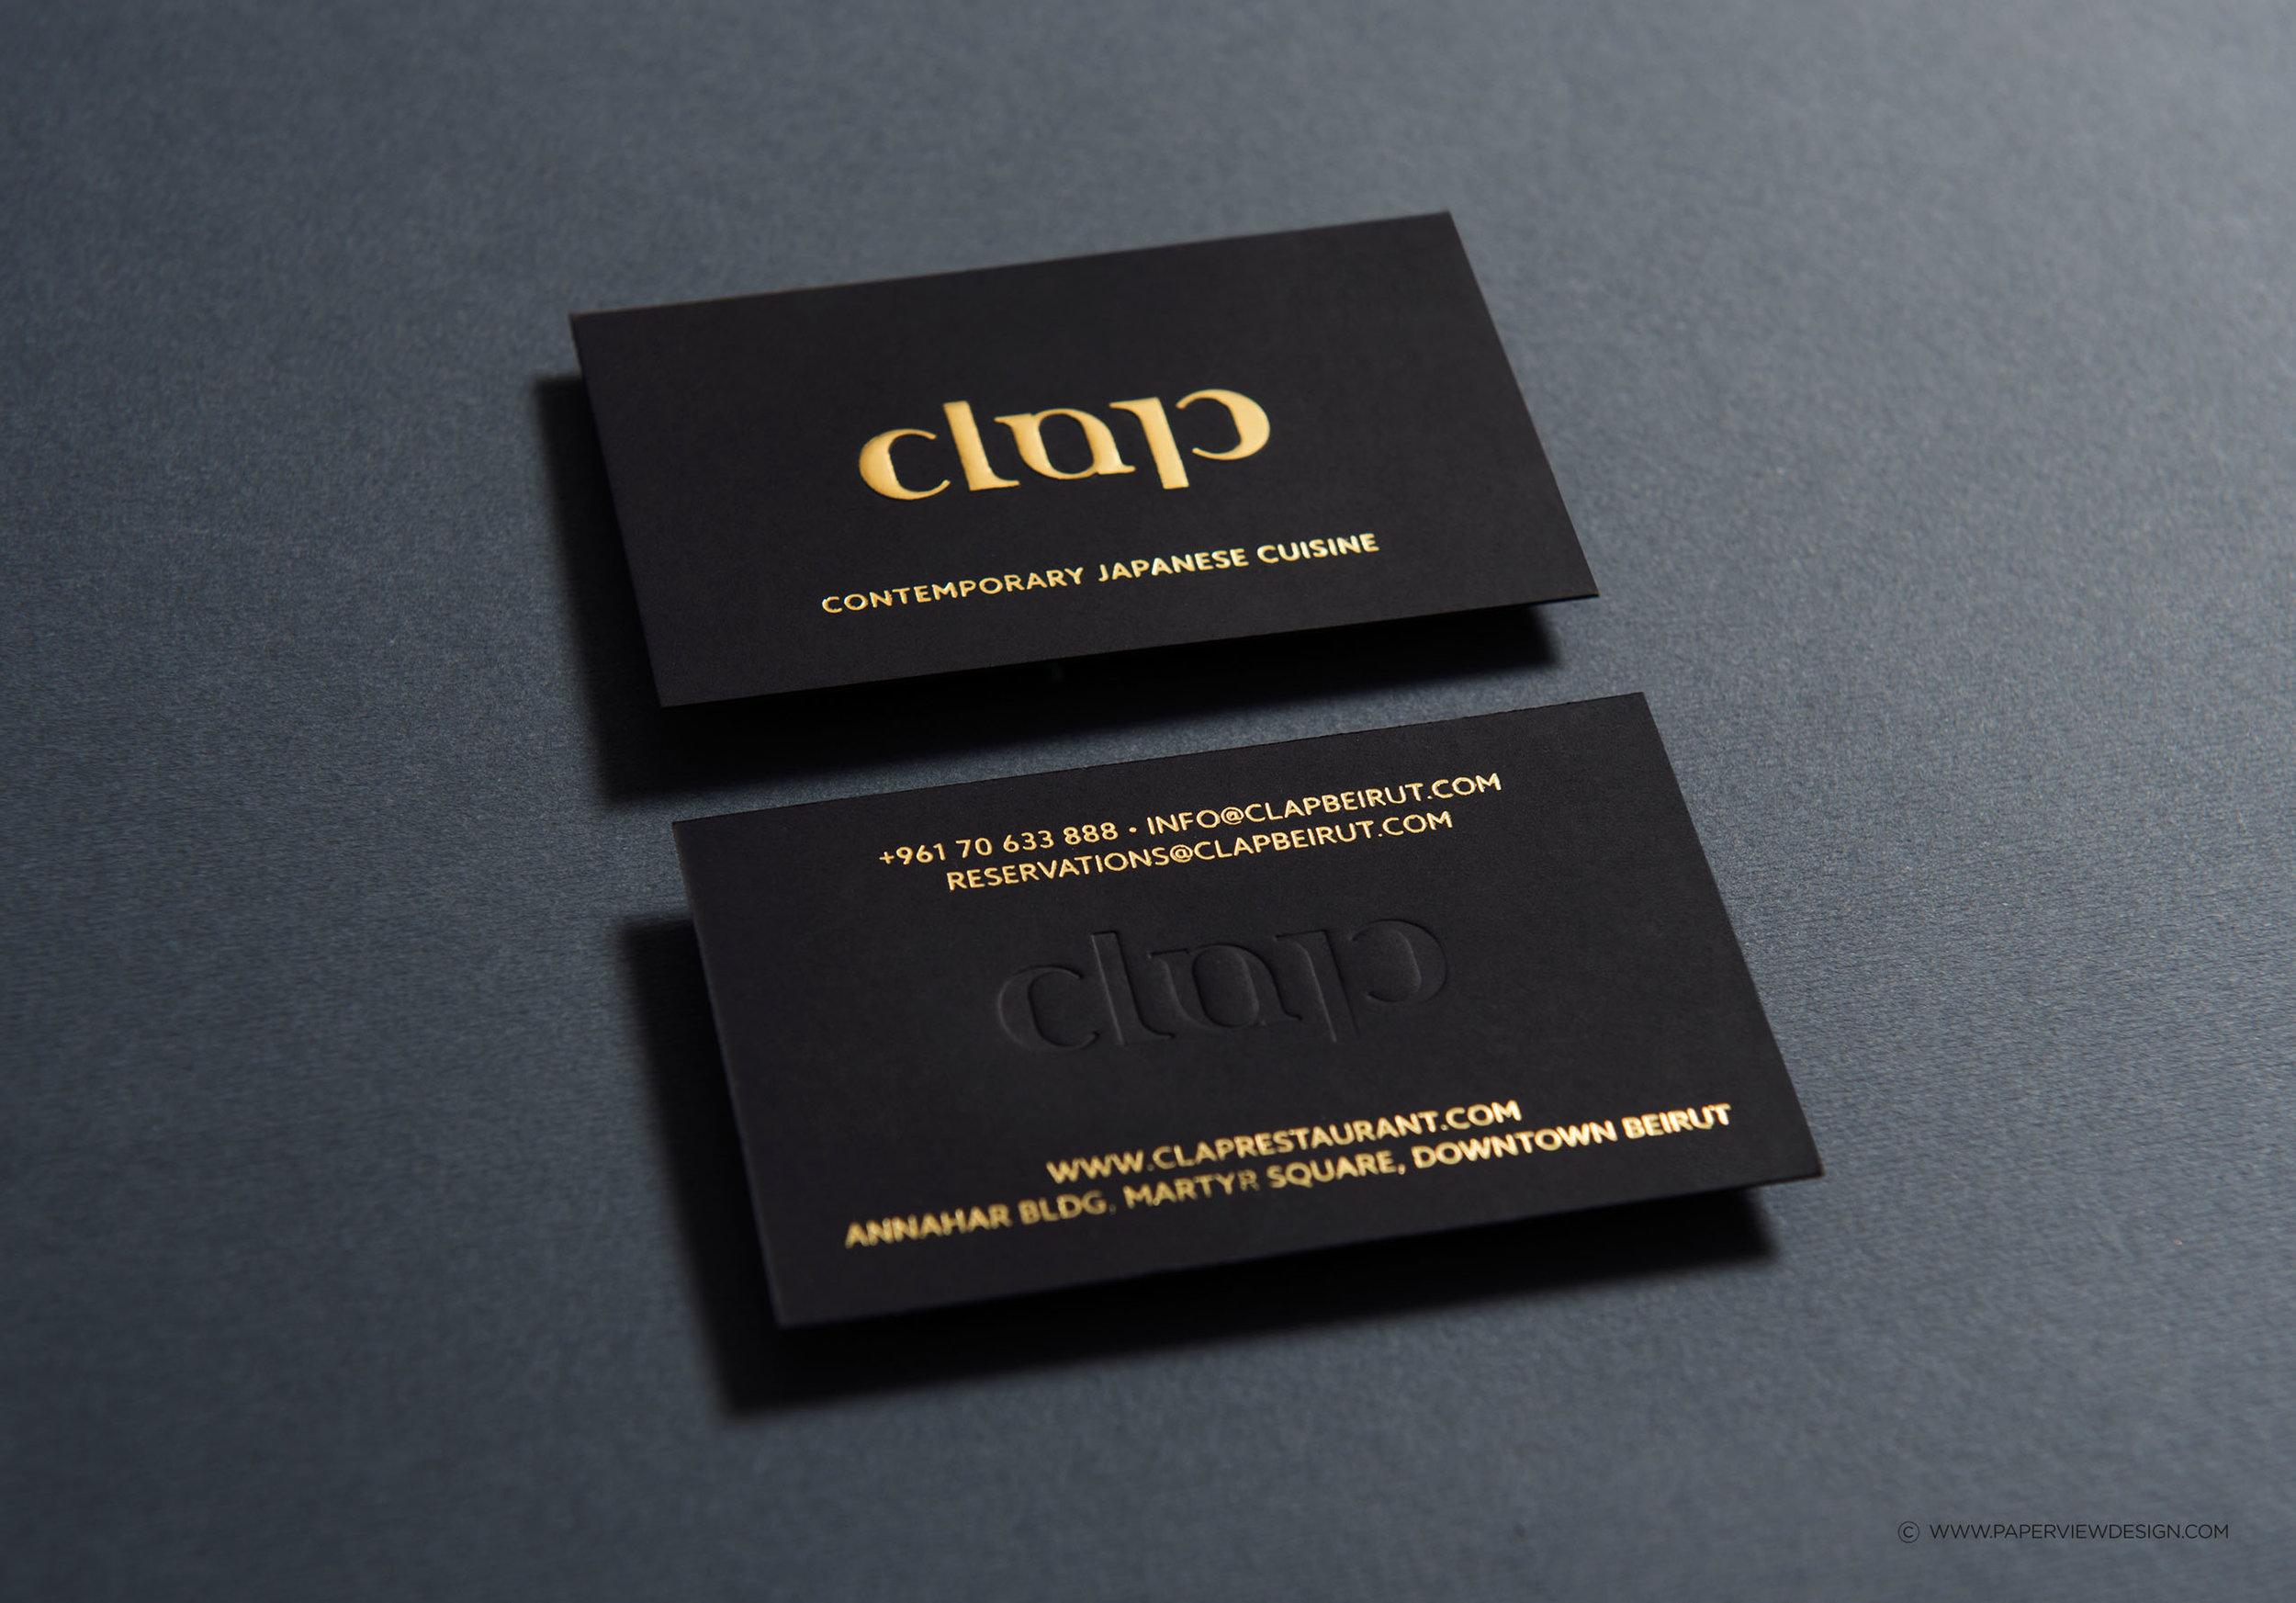 Clap-Japanese-Contemporary-Cuisine-Business-Card-Identity-Branding